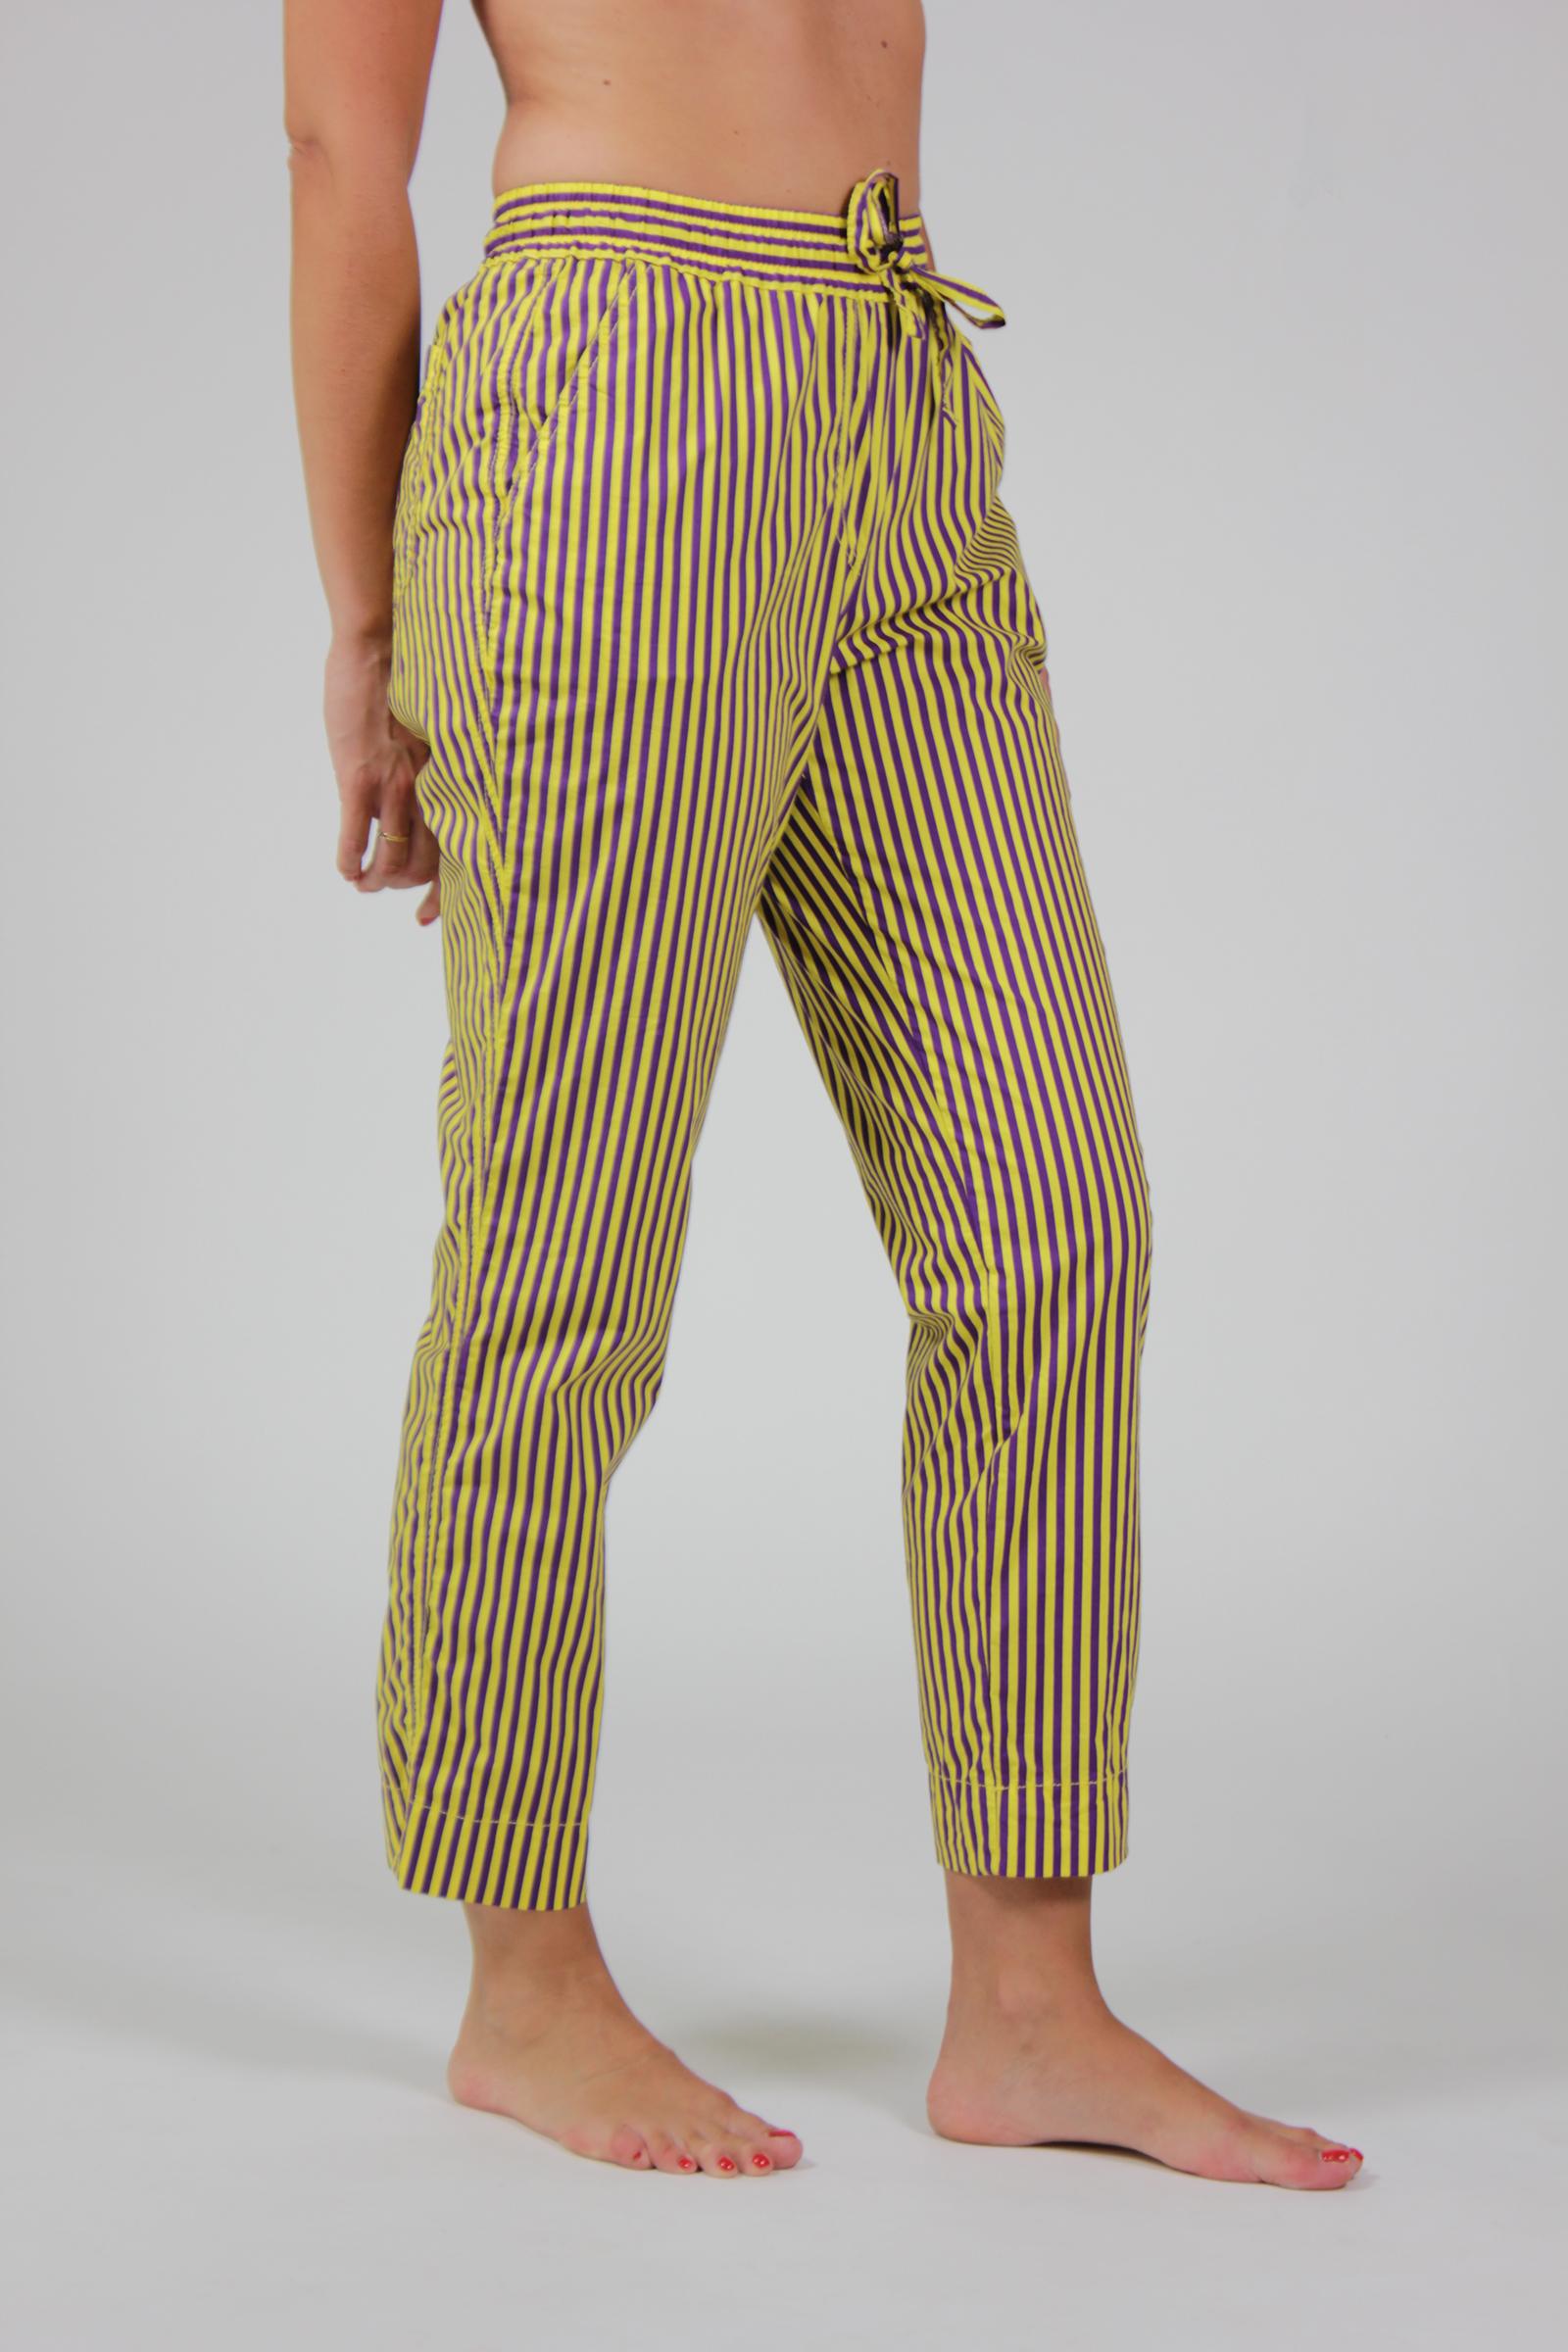 pantalone P.A.R.O.S.H. | D230362CAMILLO844